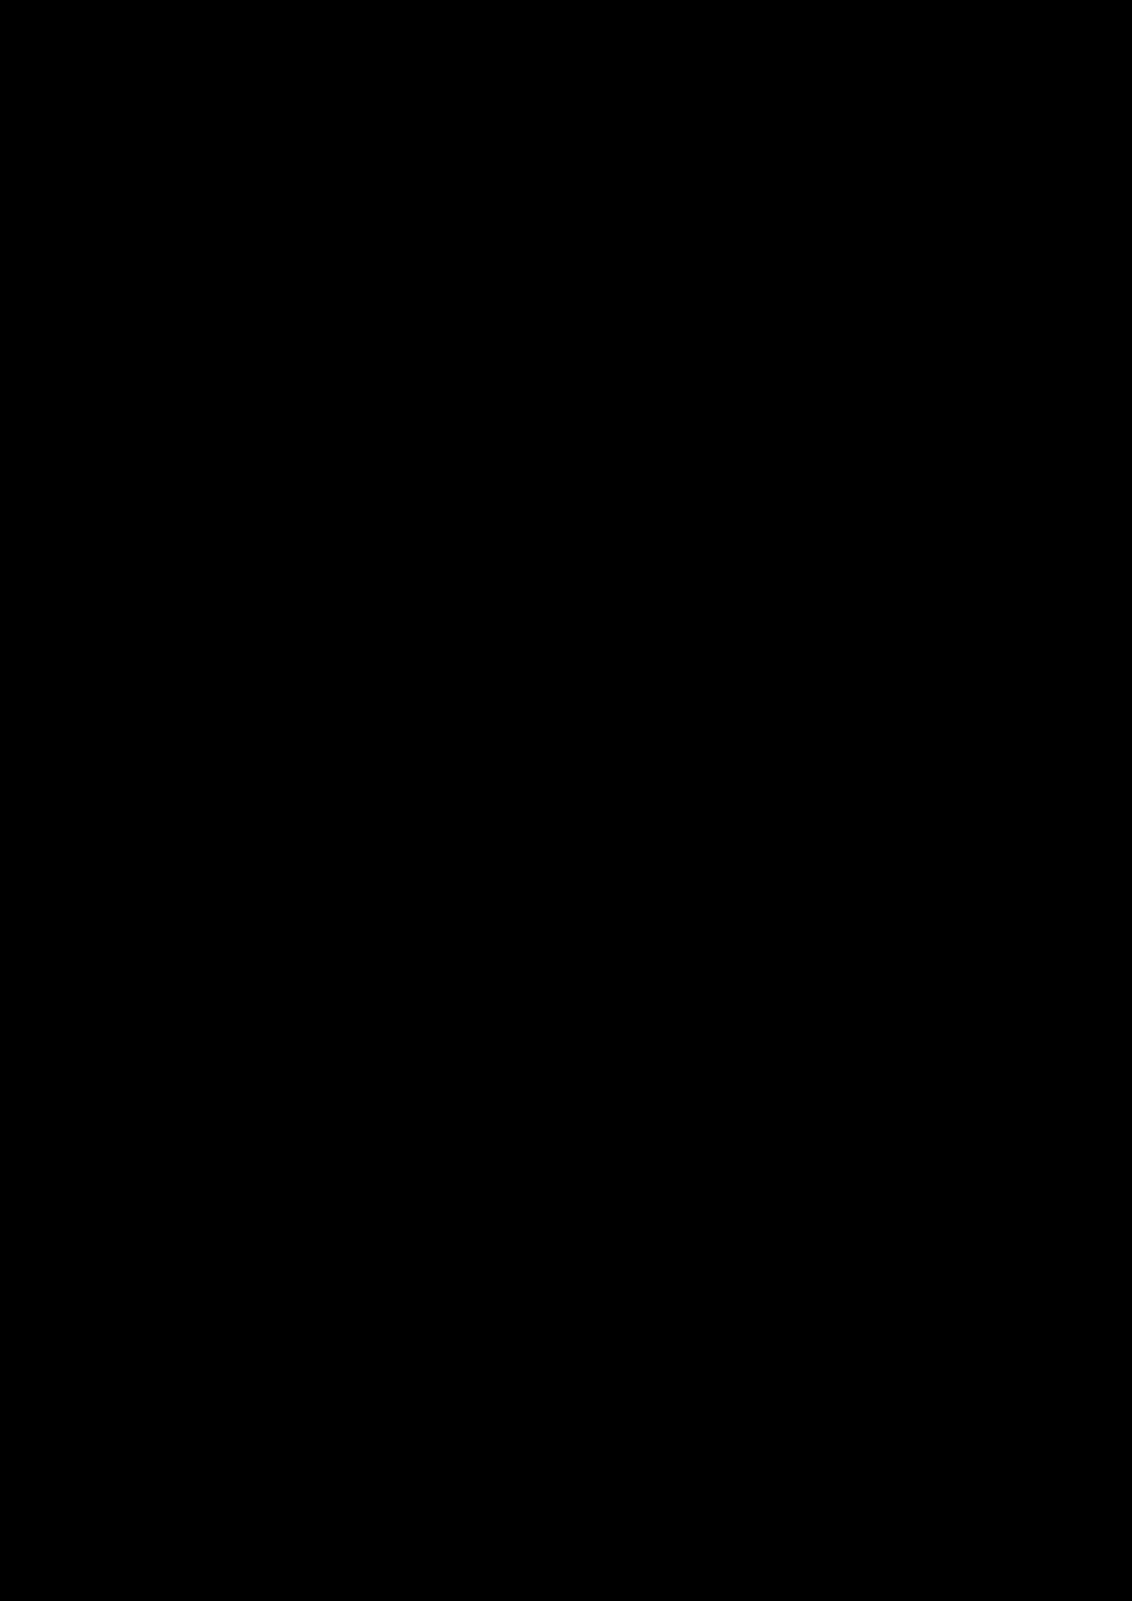 Korolevstvo slez slide, Image 58